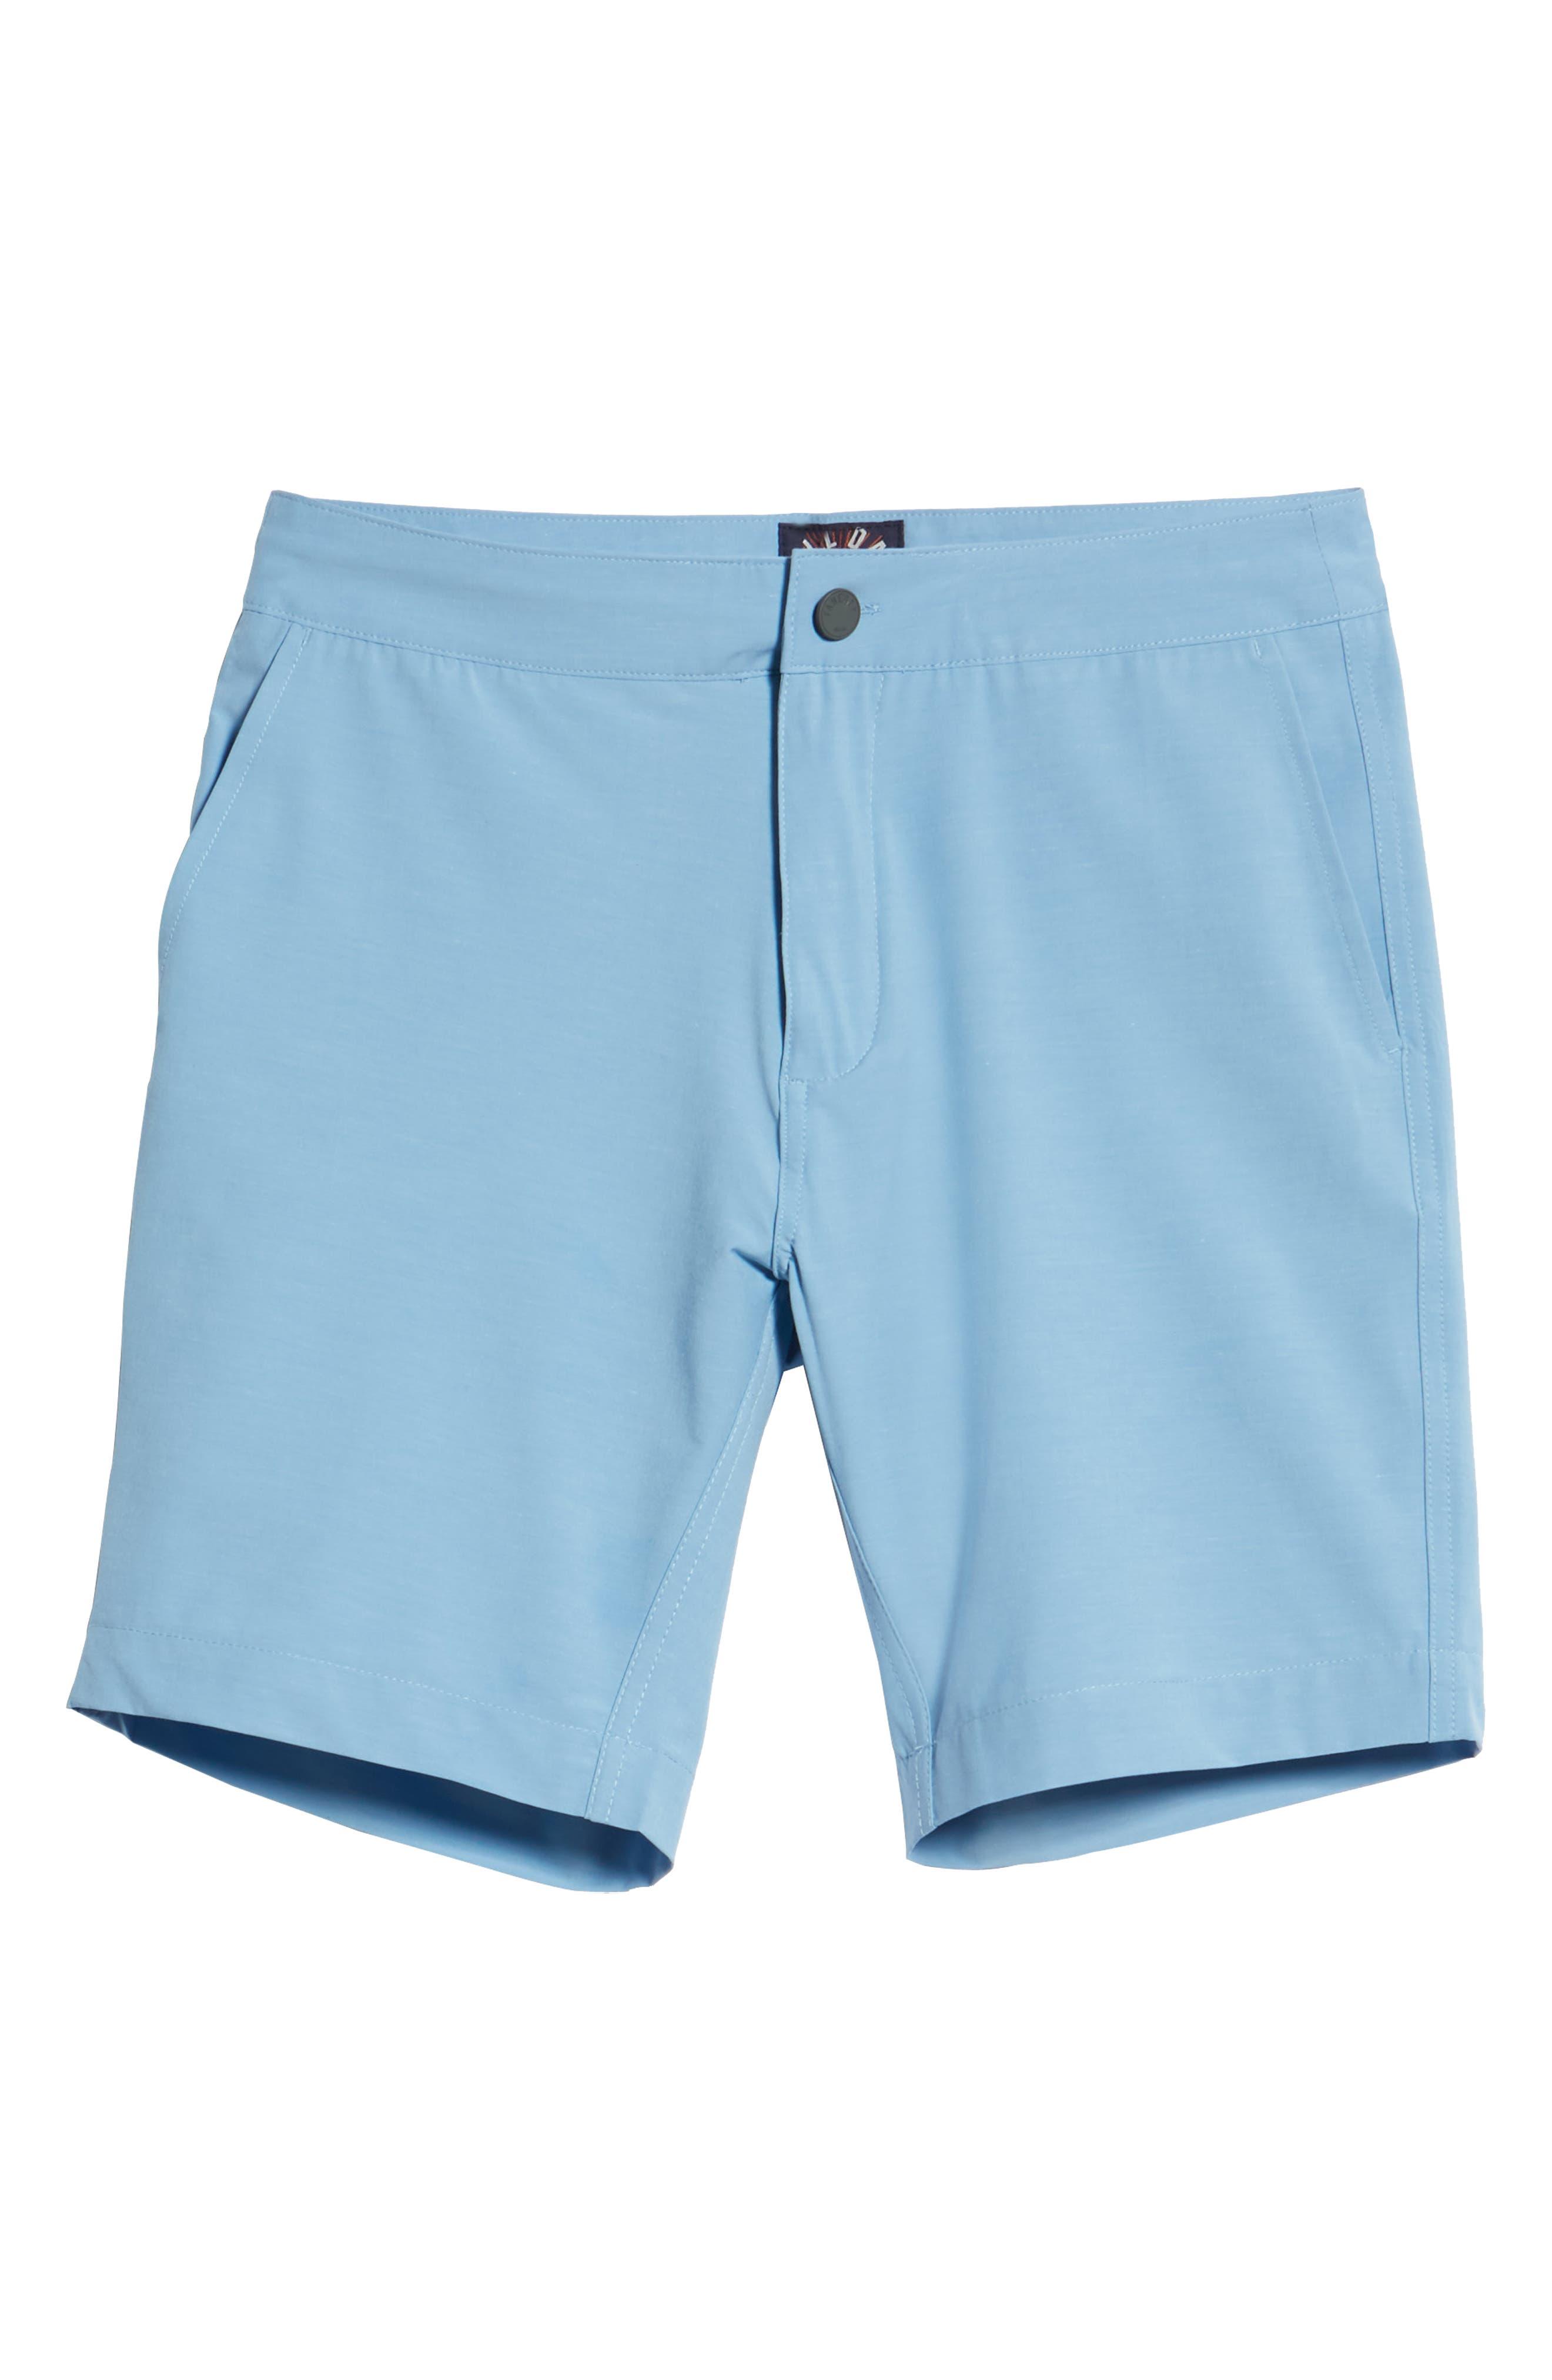 All Day Flat Front Shorts,                             Alternate thumbnail 6, color,                             COASTAL BLUE